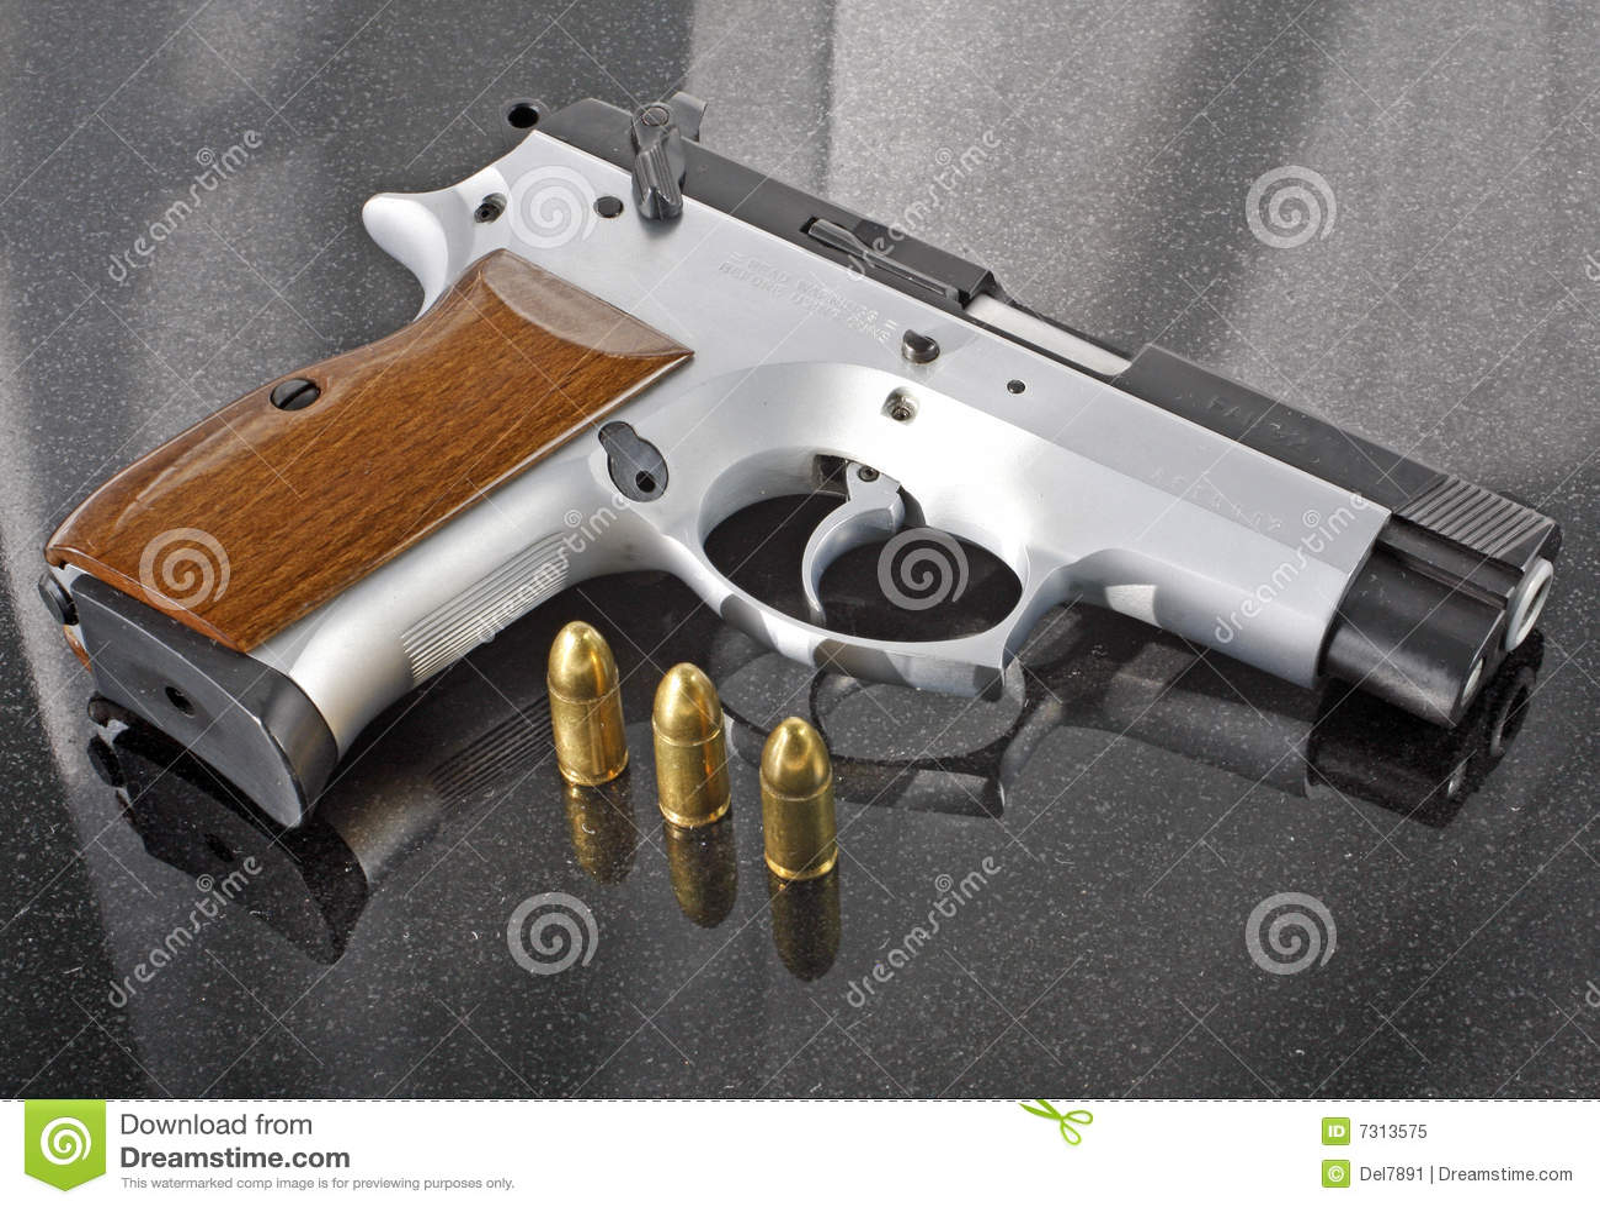 fotos gun bullet - photo #6